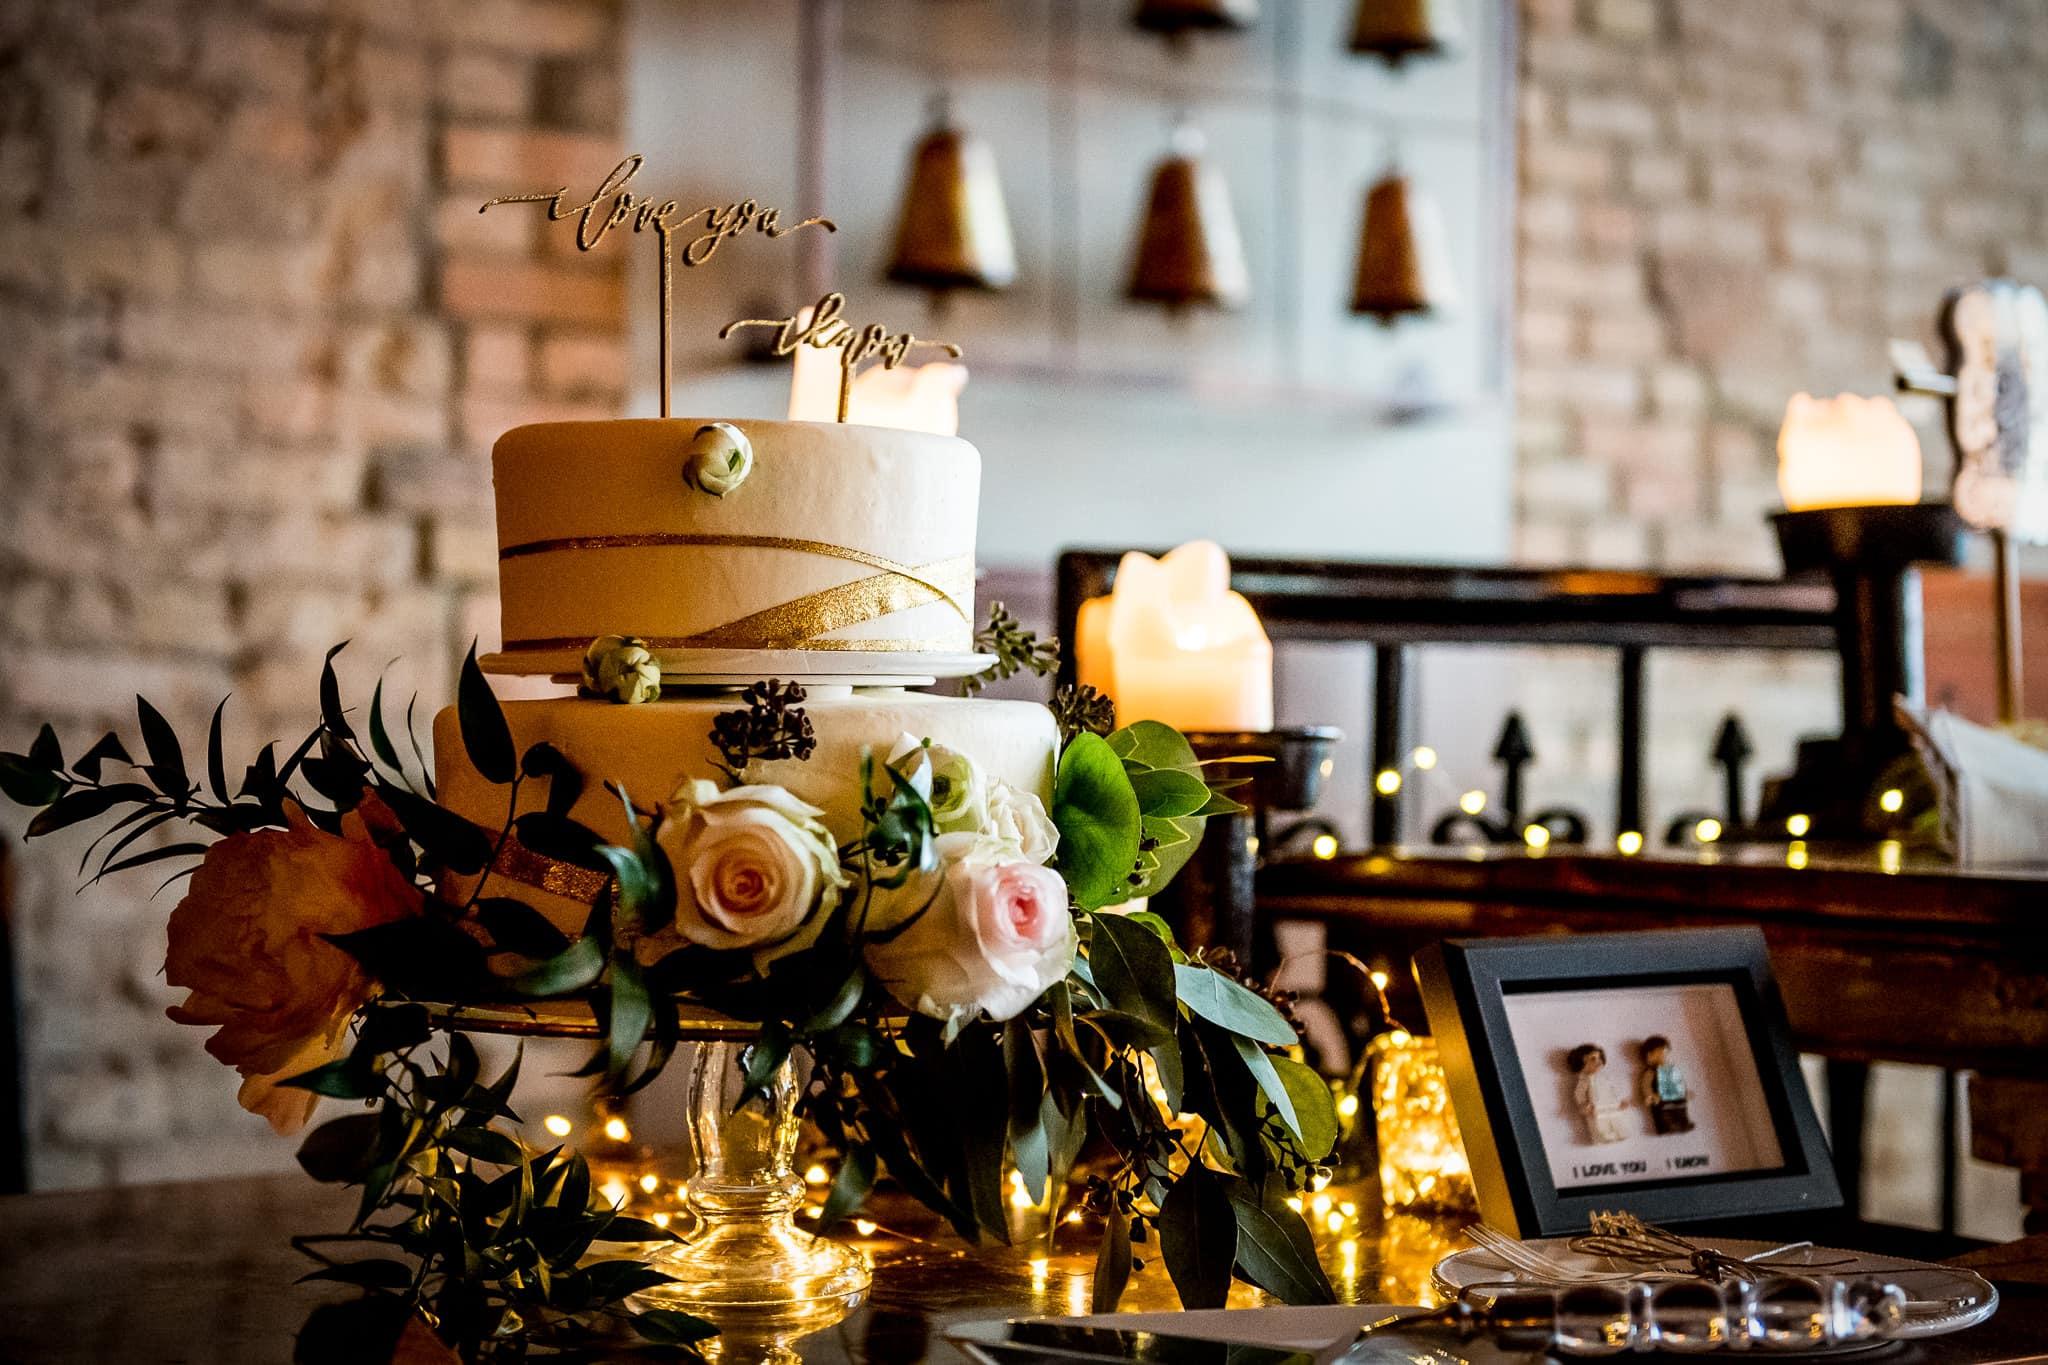 Aster Cafe Wedding Cake 2